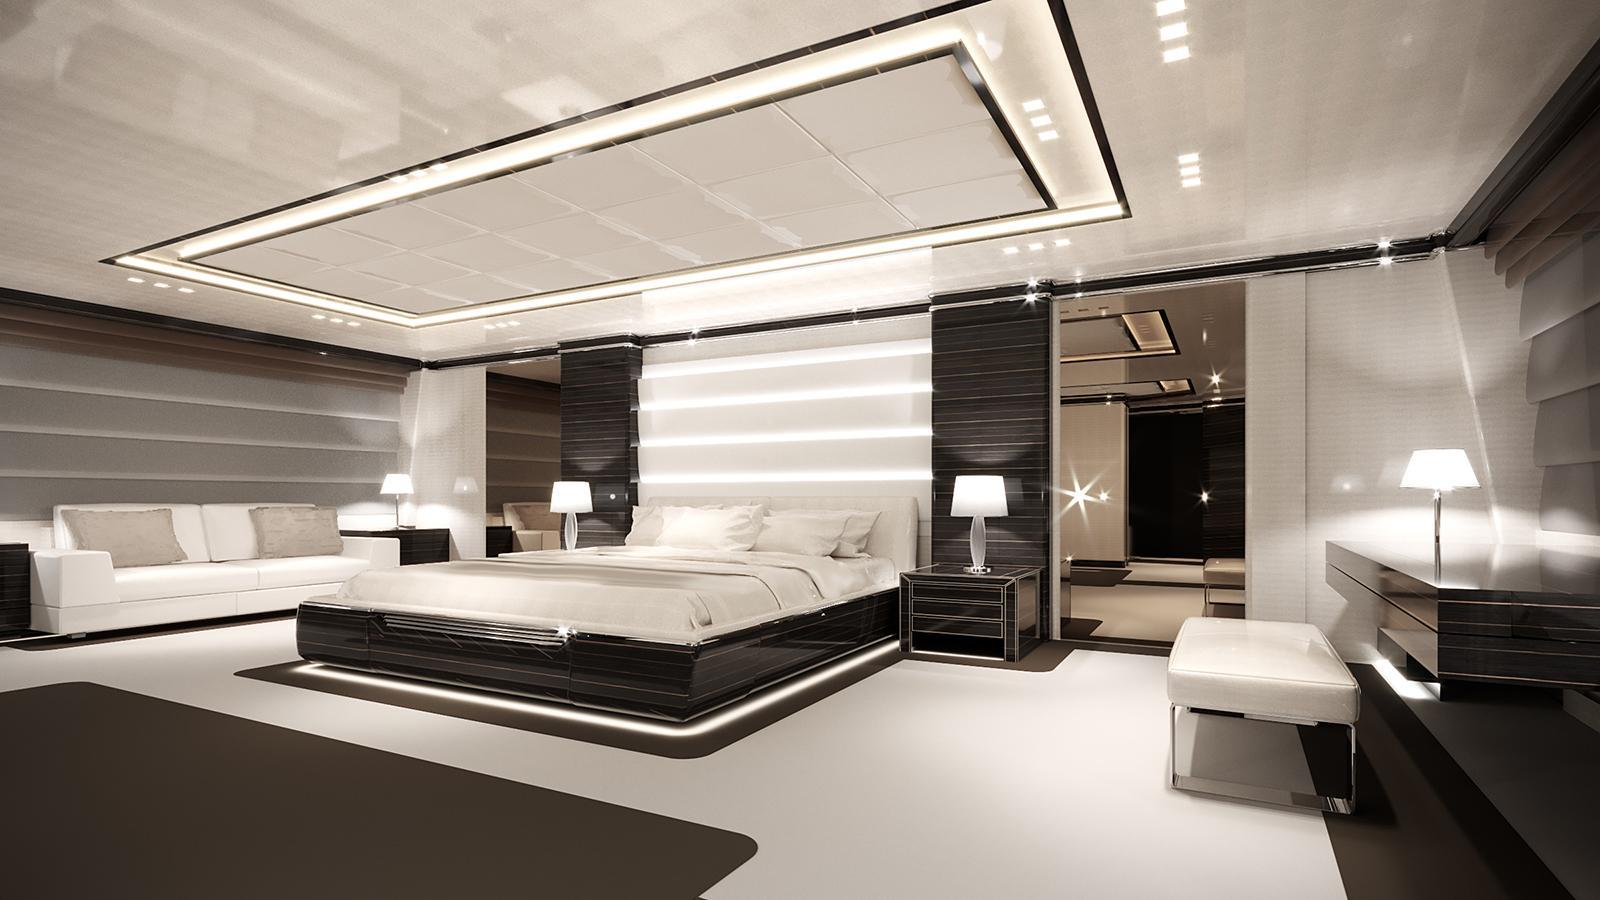 o mathilde motoryacht golden yachts 57m 2018 rendering master